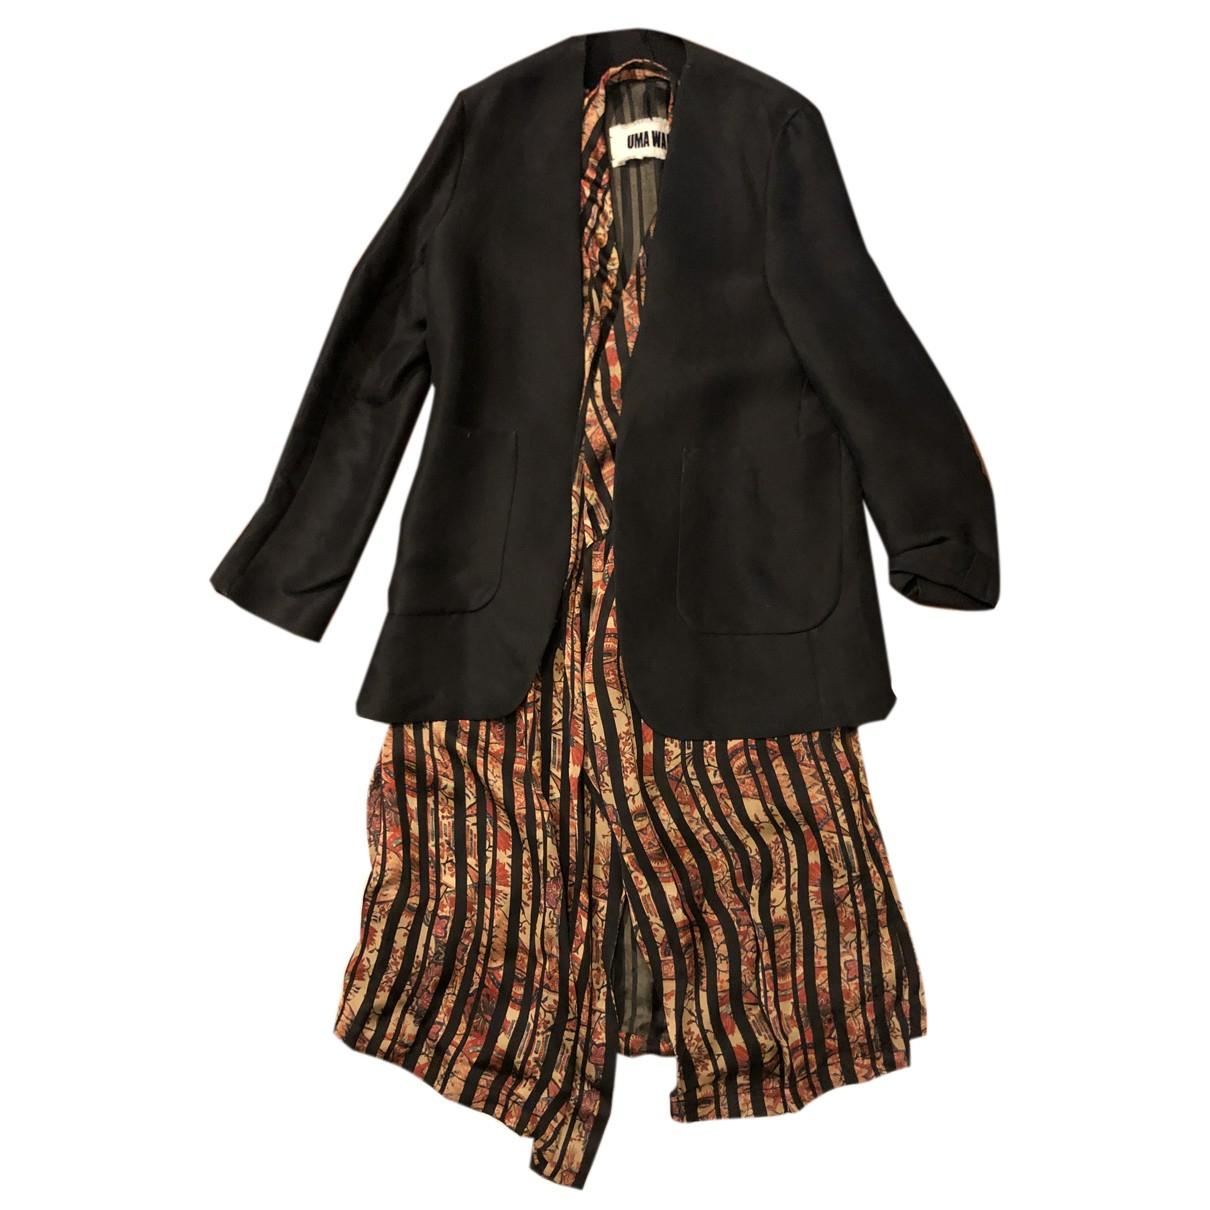 Uma Wang \N Jacke in  Schwarz Polyester